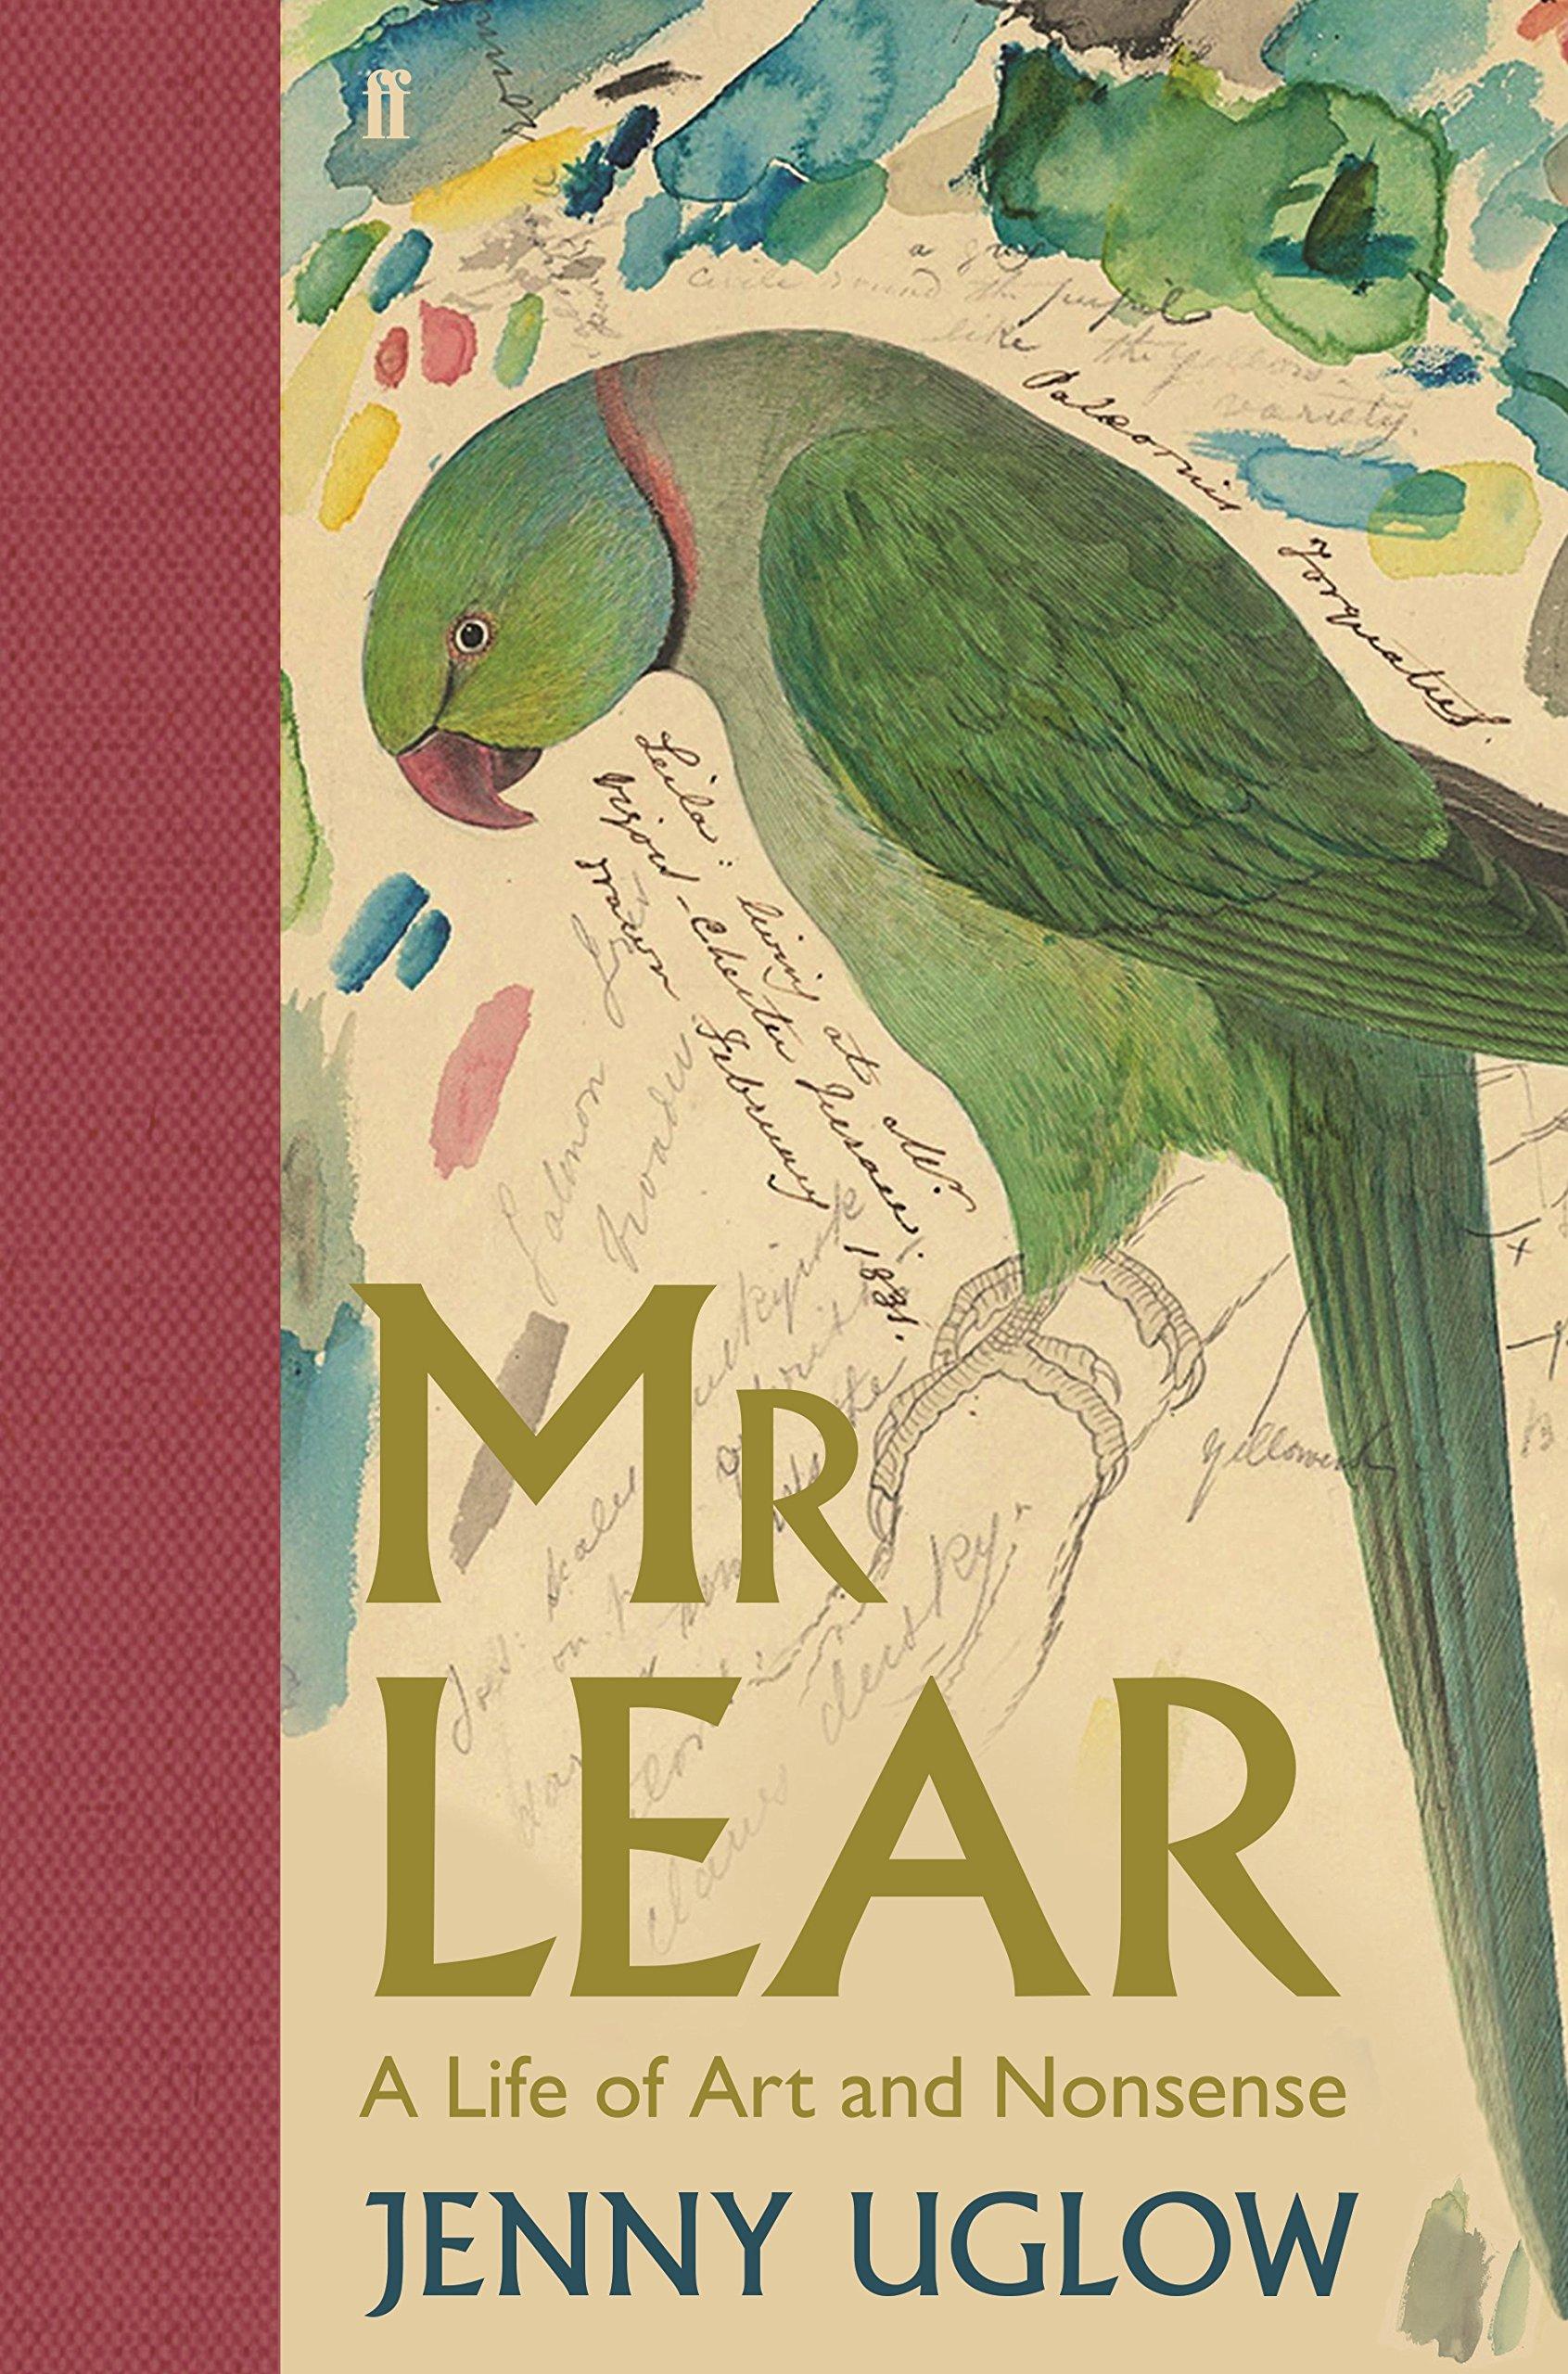 fcb3f60c4 Mr Lear  A Life of Art and Nonsense  Amazon.co.uk  Jenny Uglow ...